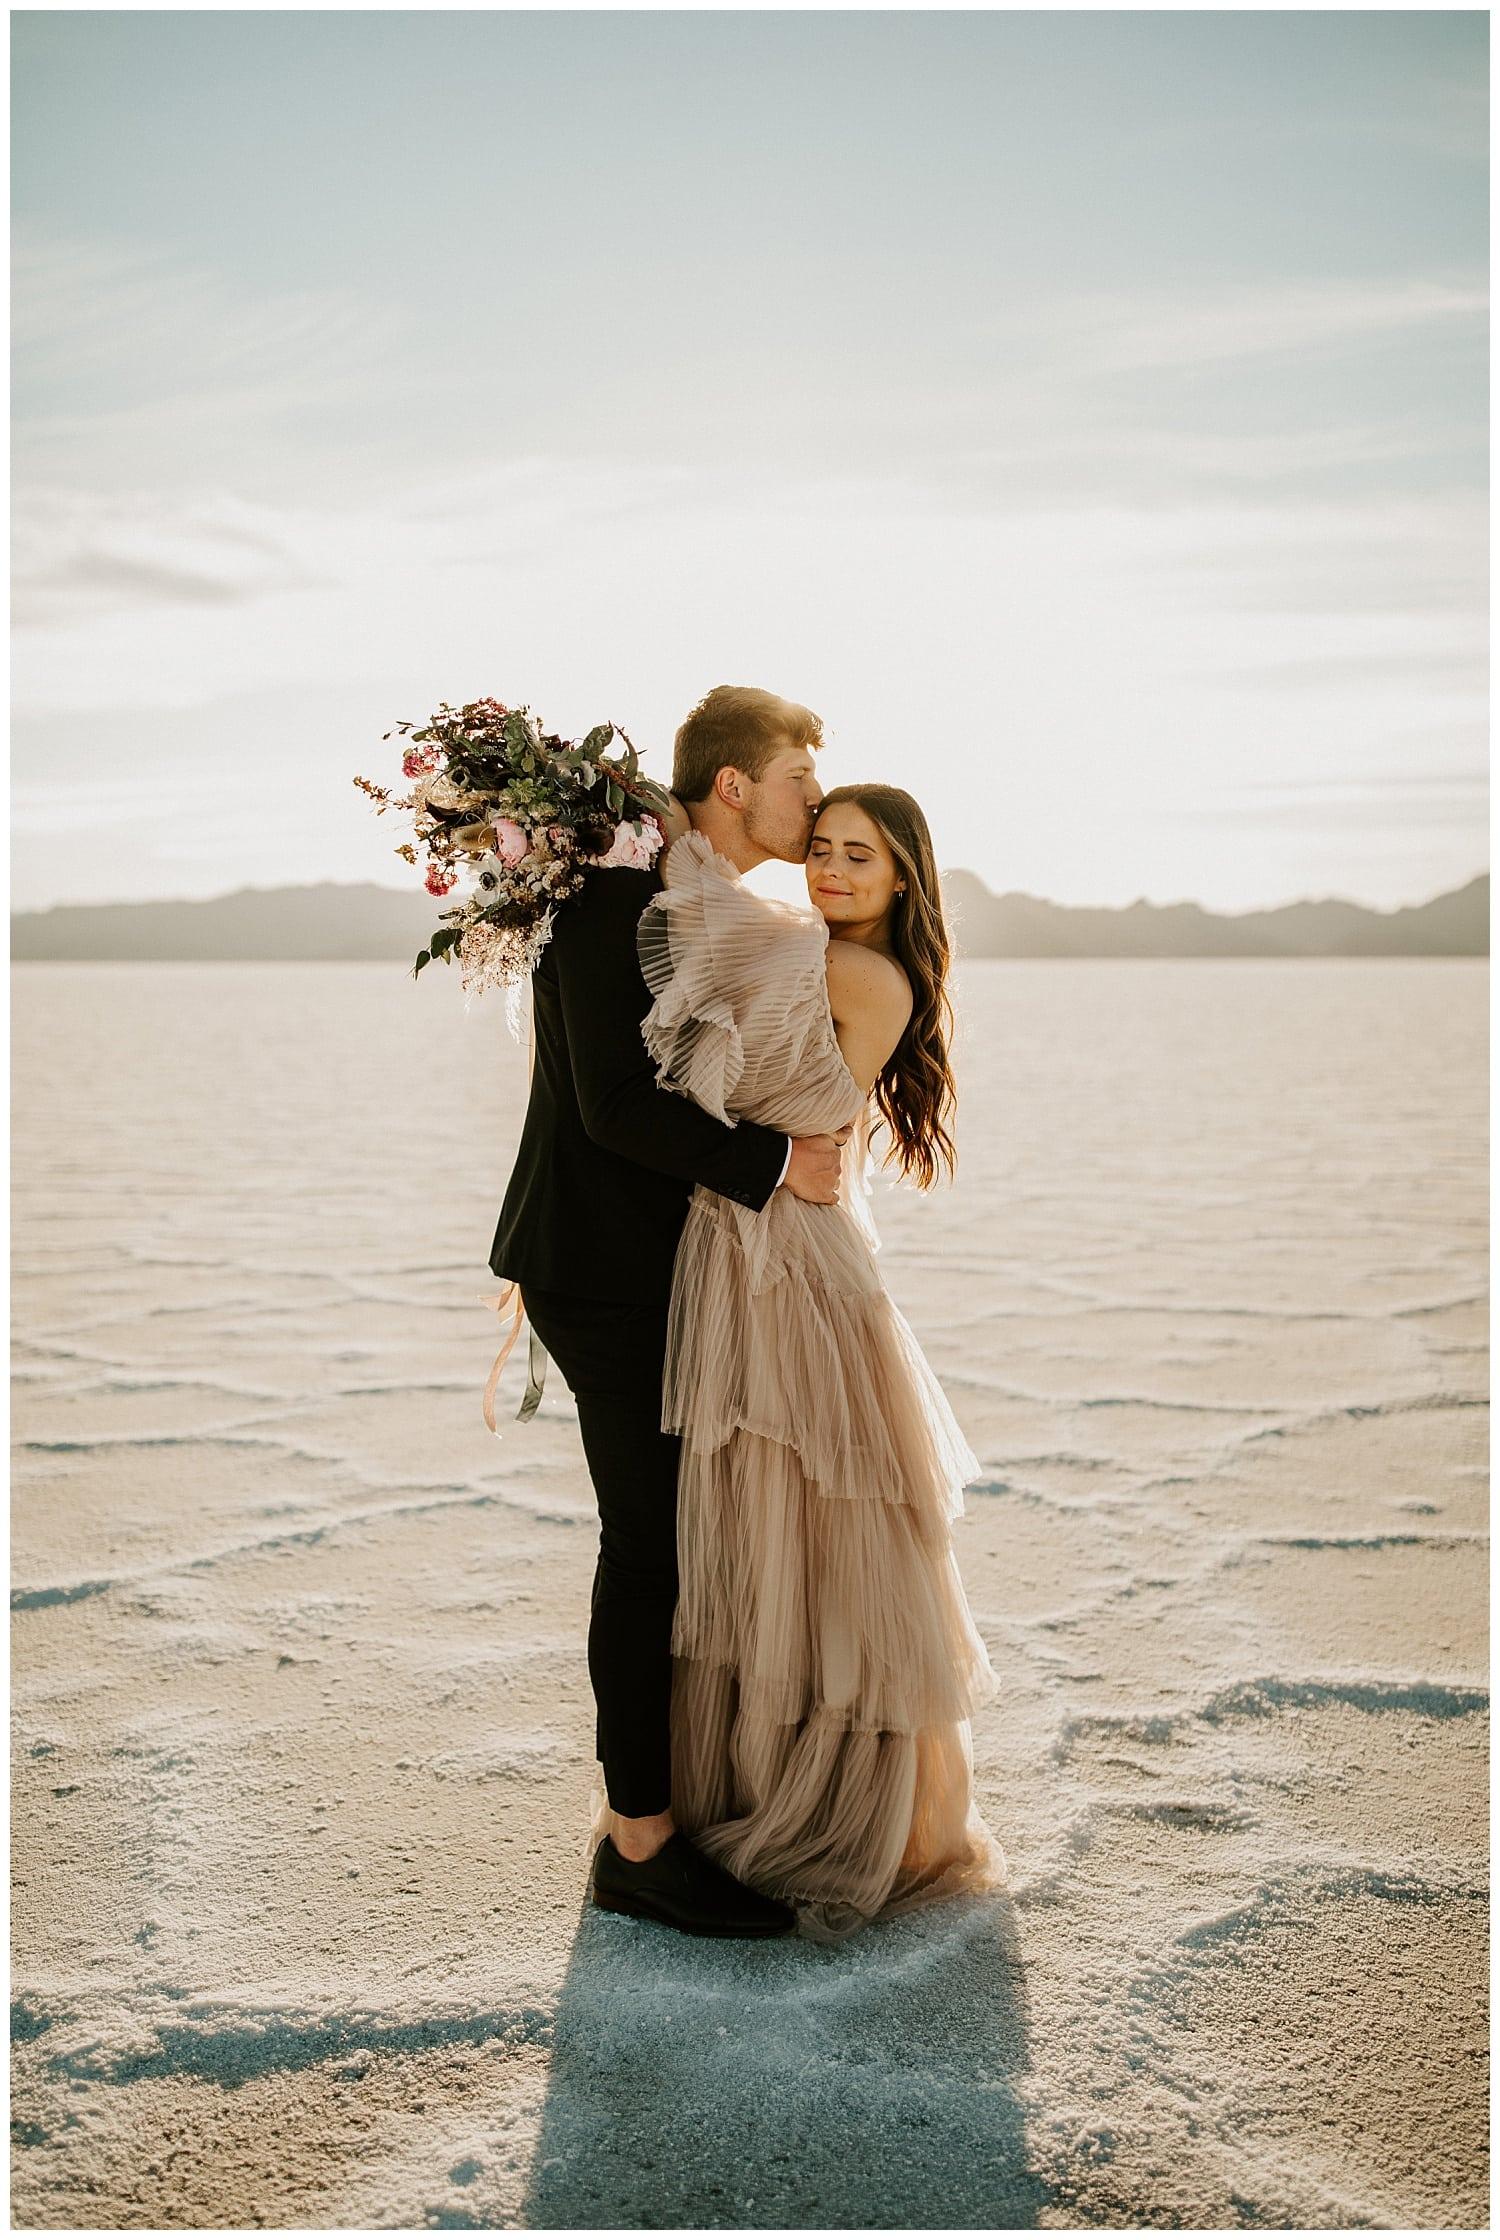 bonneville salt flats sunset, utah photographers, wedding photographers in salt lake city